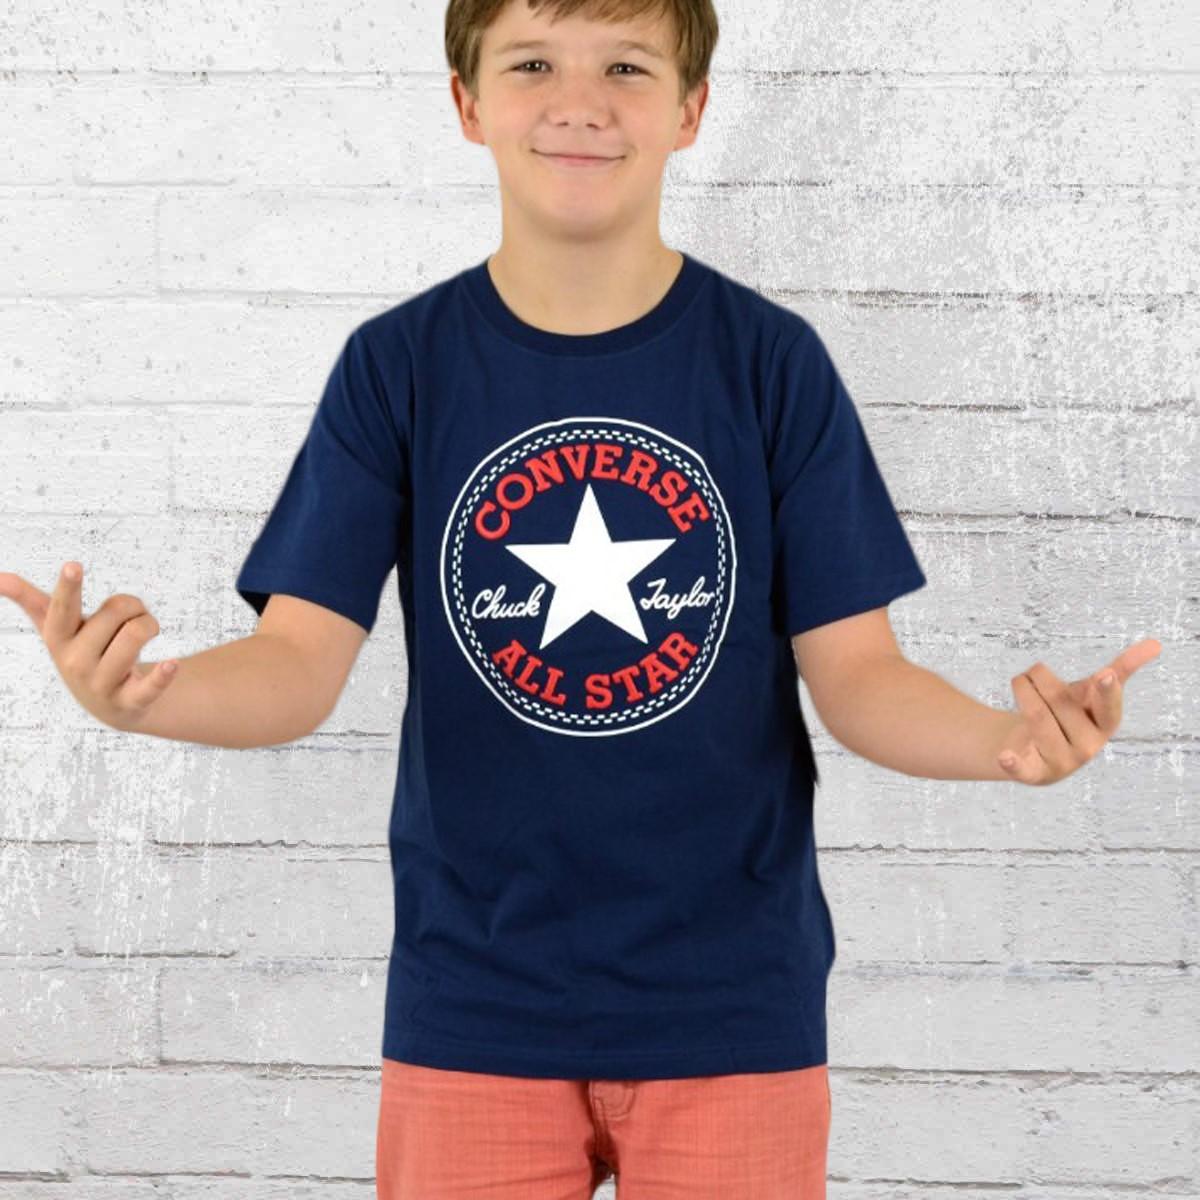 tee shirt converse junior